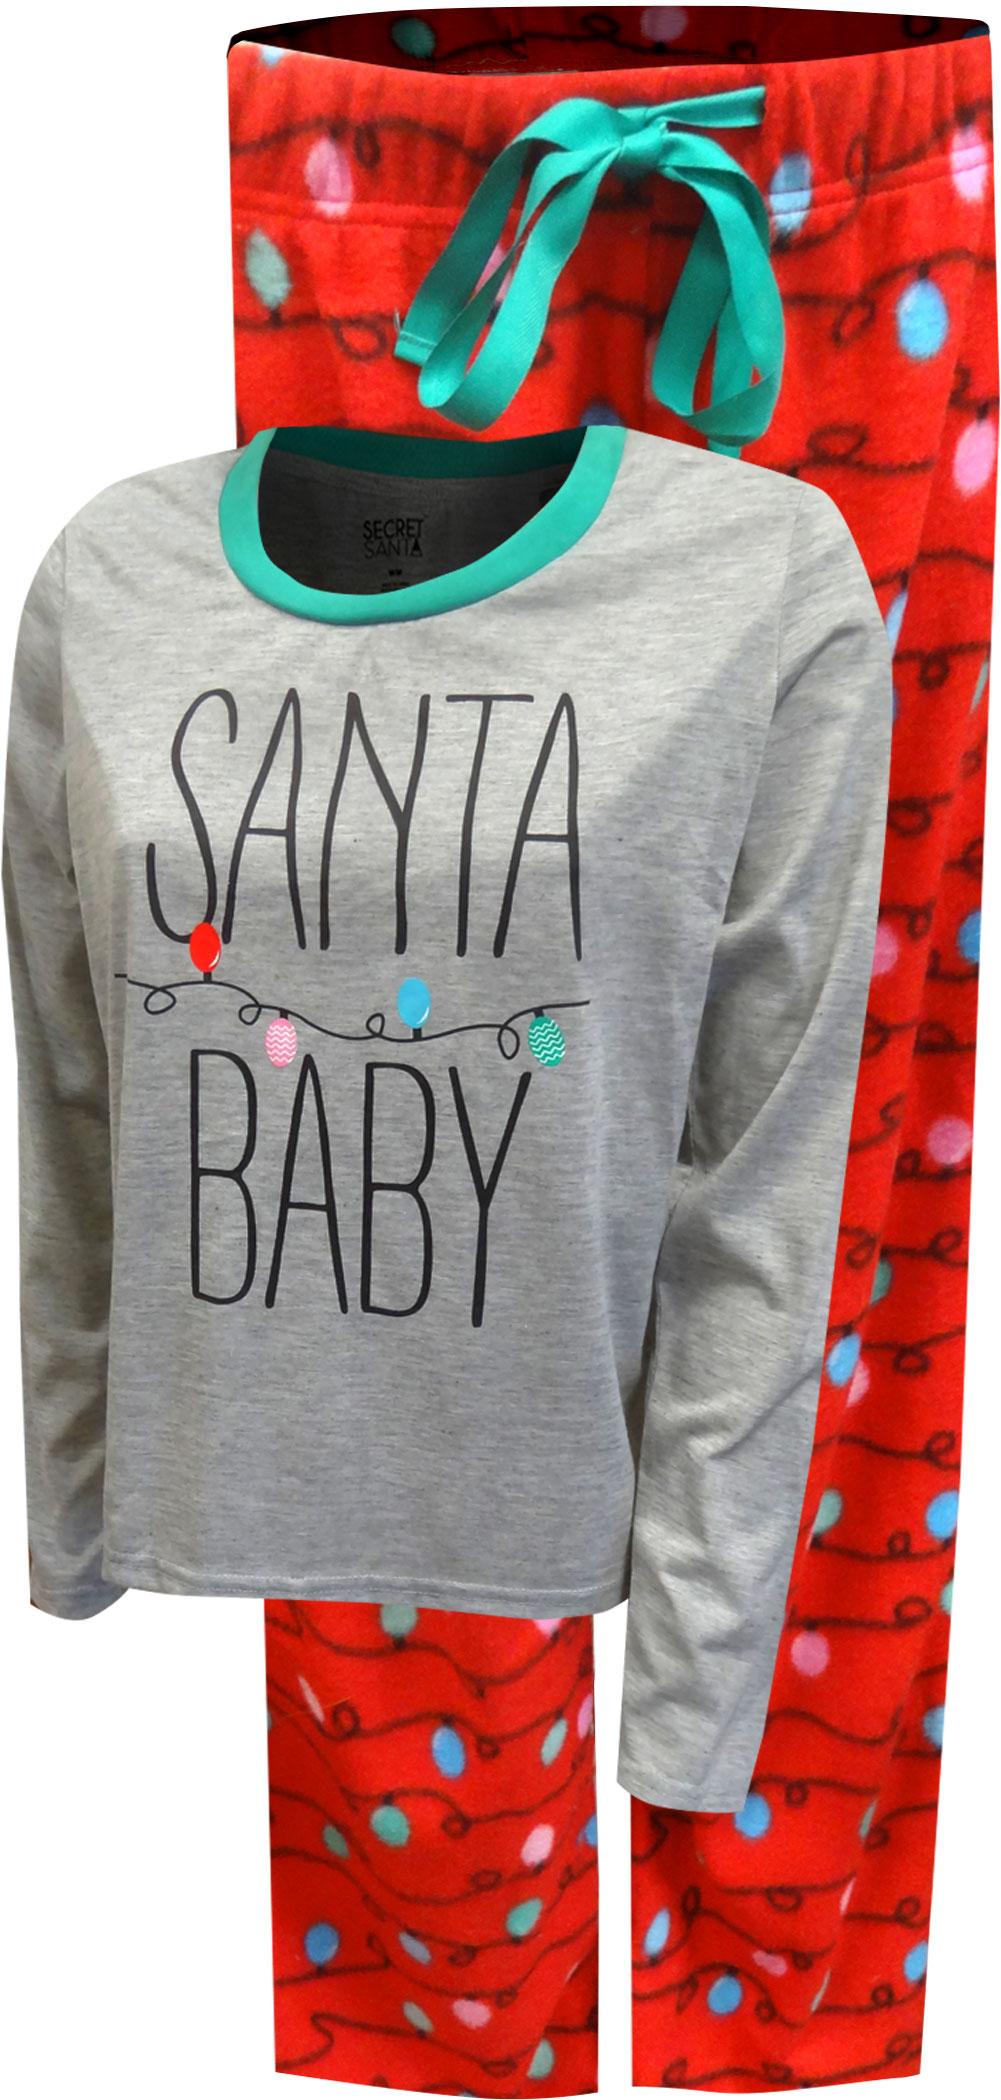 Image of Santa Baby Christmas Pajama for Women